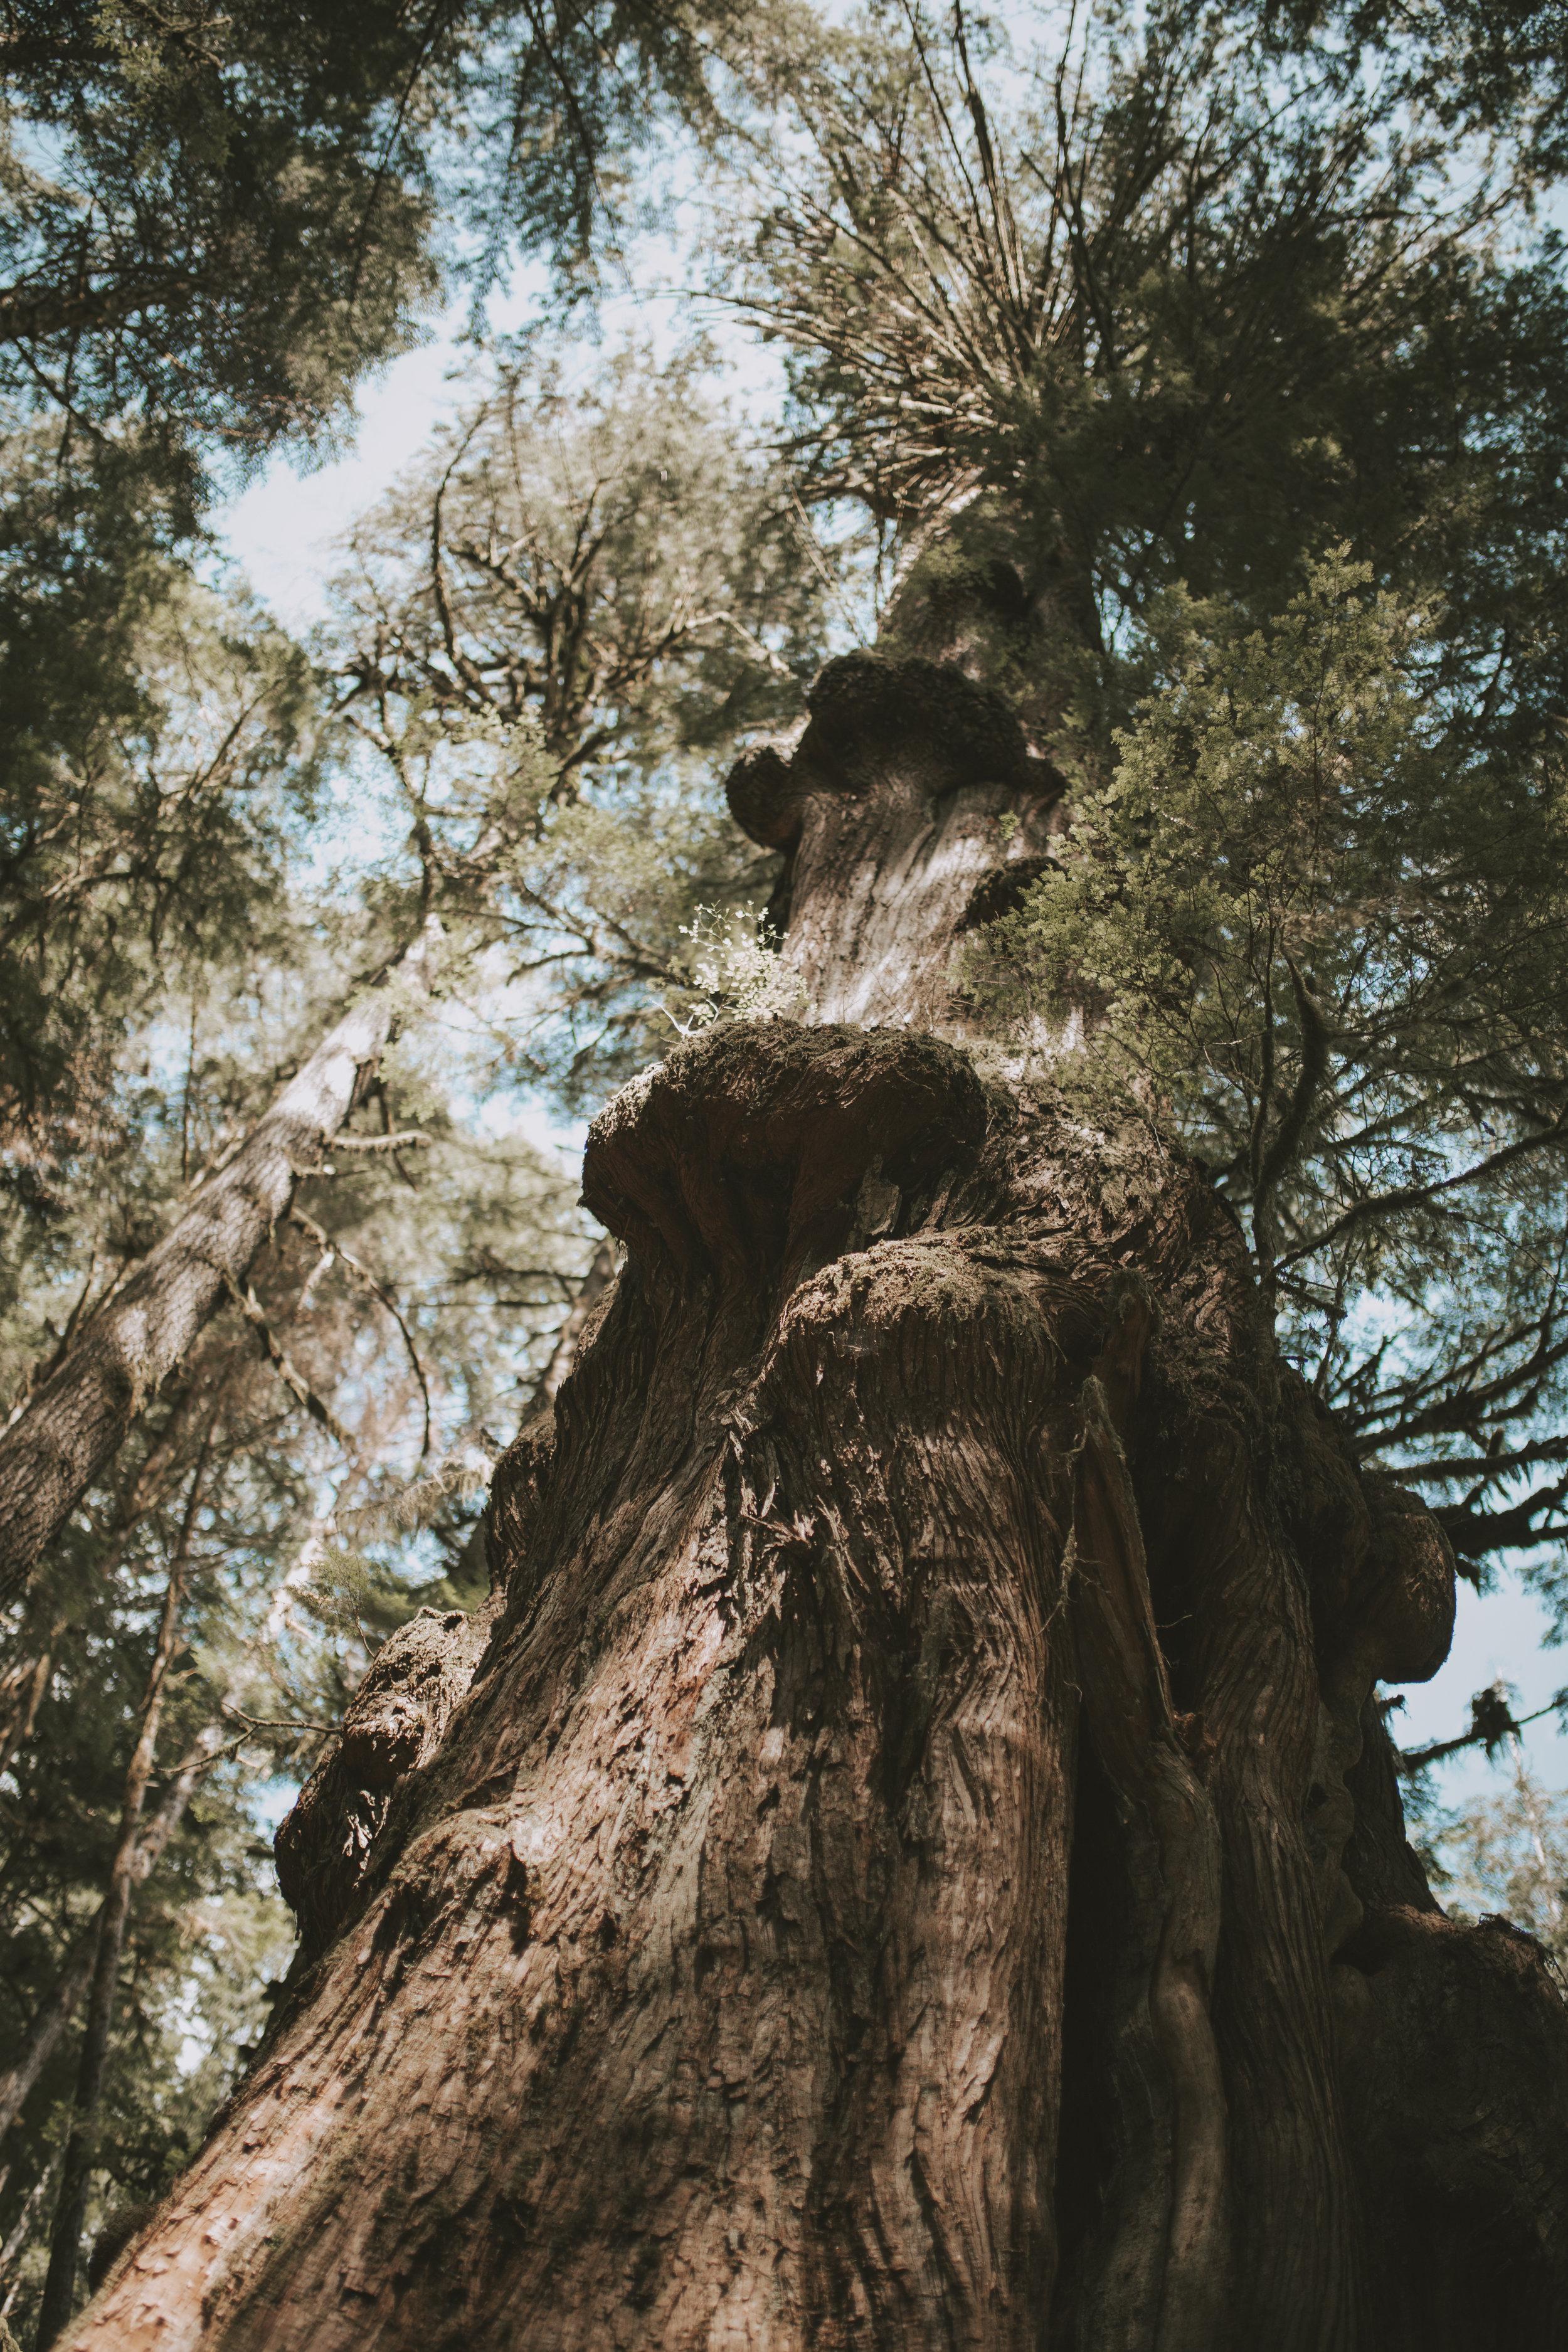 patagonia-2019-emilybeekscreative-54.jpg